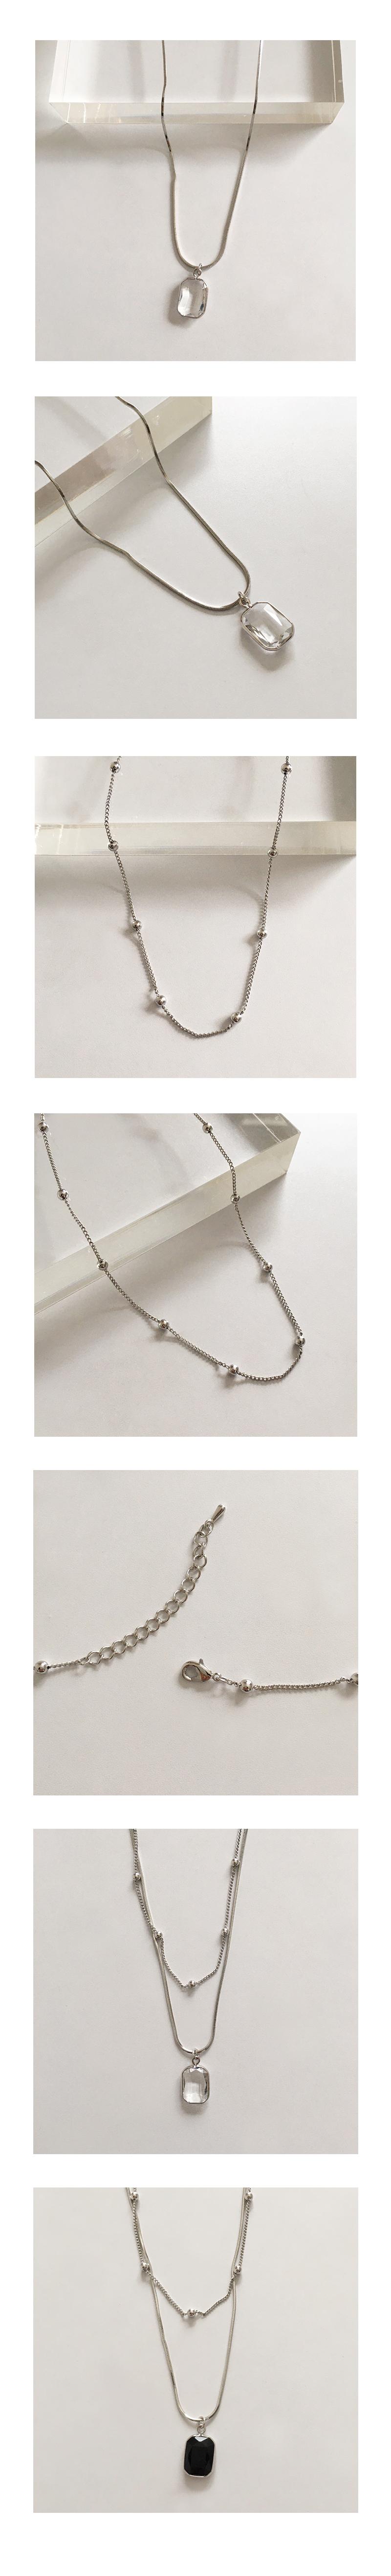 slit necklace set